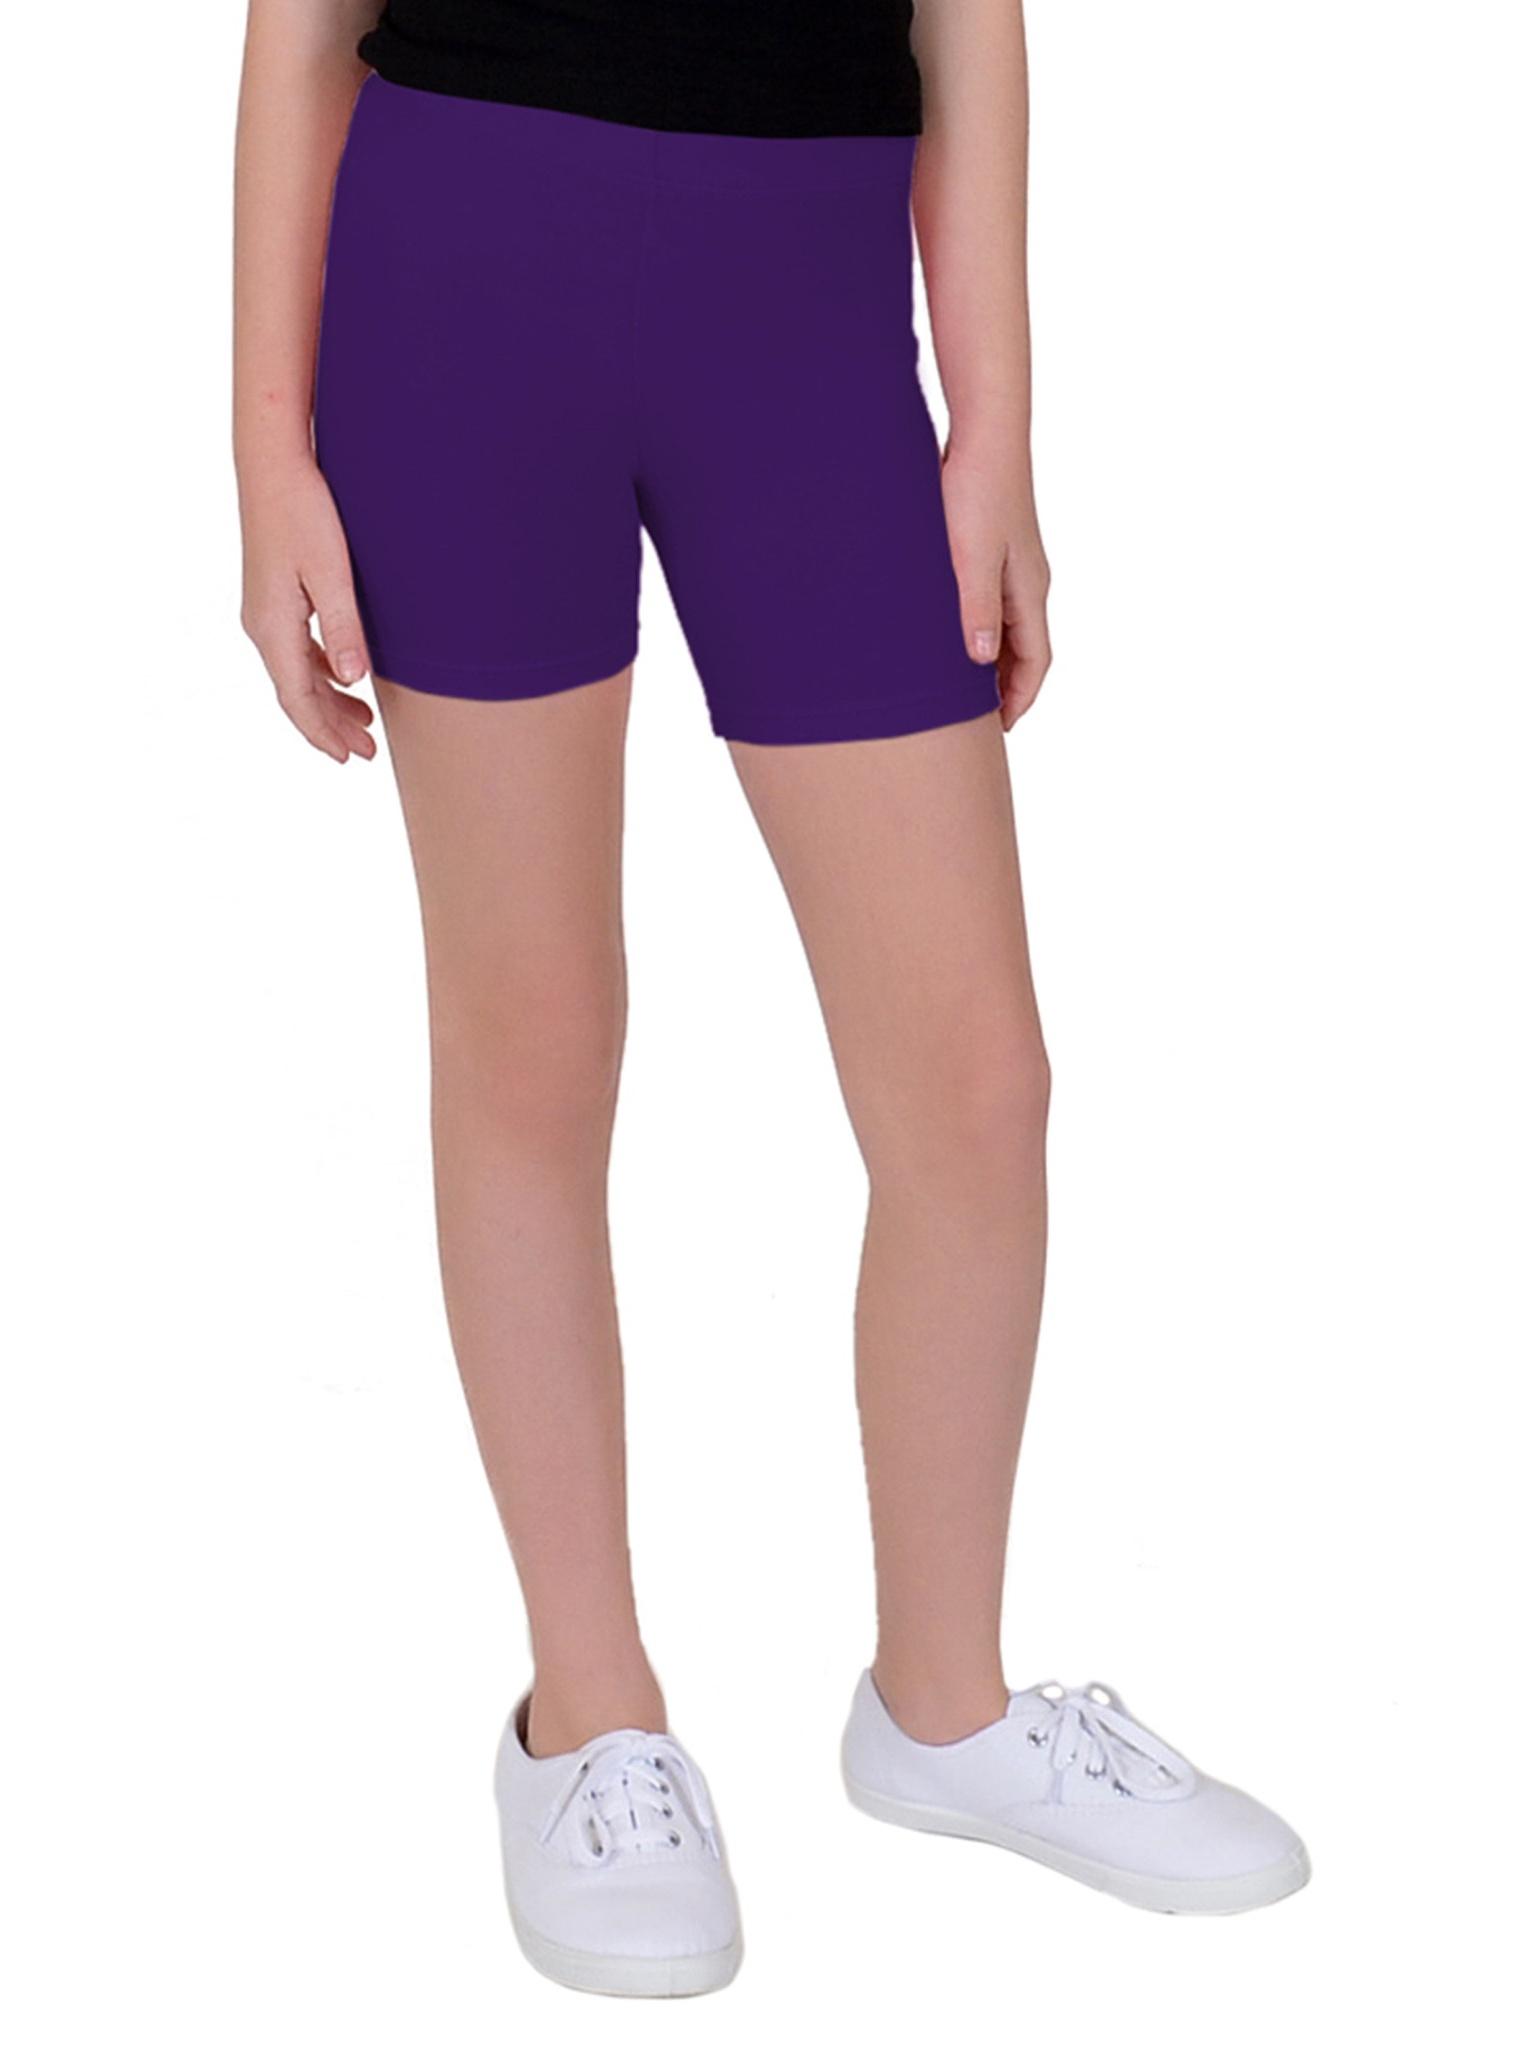 Girl's Cotton Biker Shorts - Small (6) / Beige